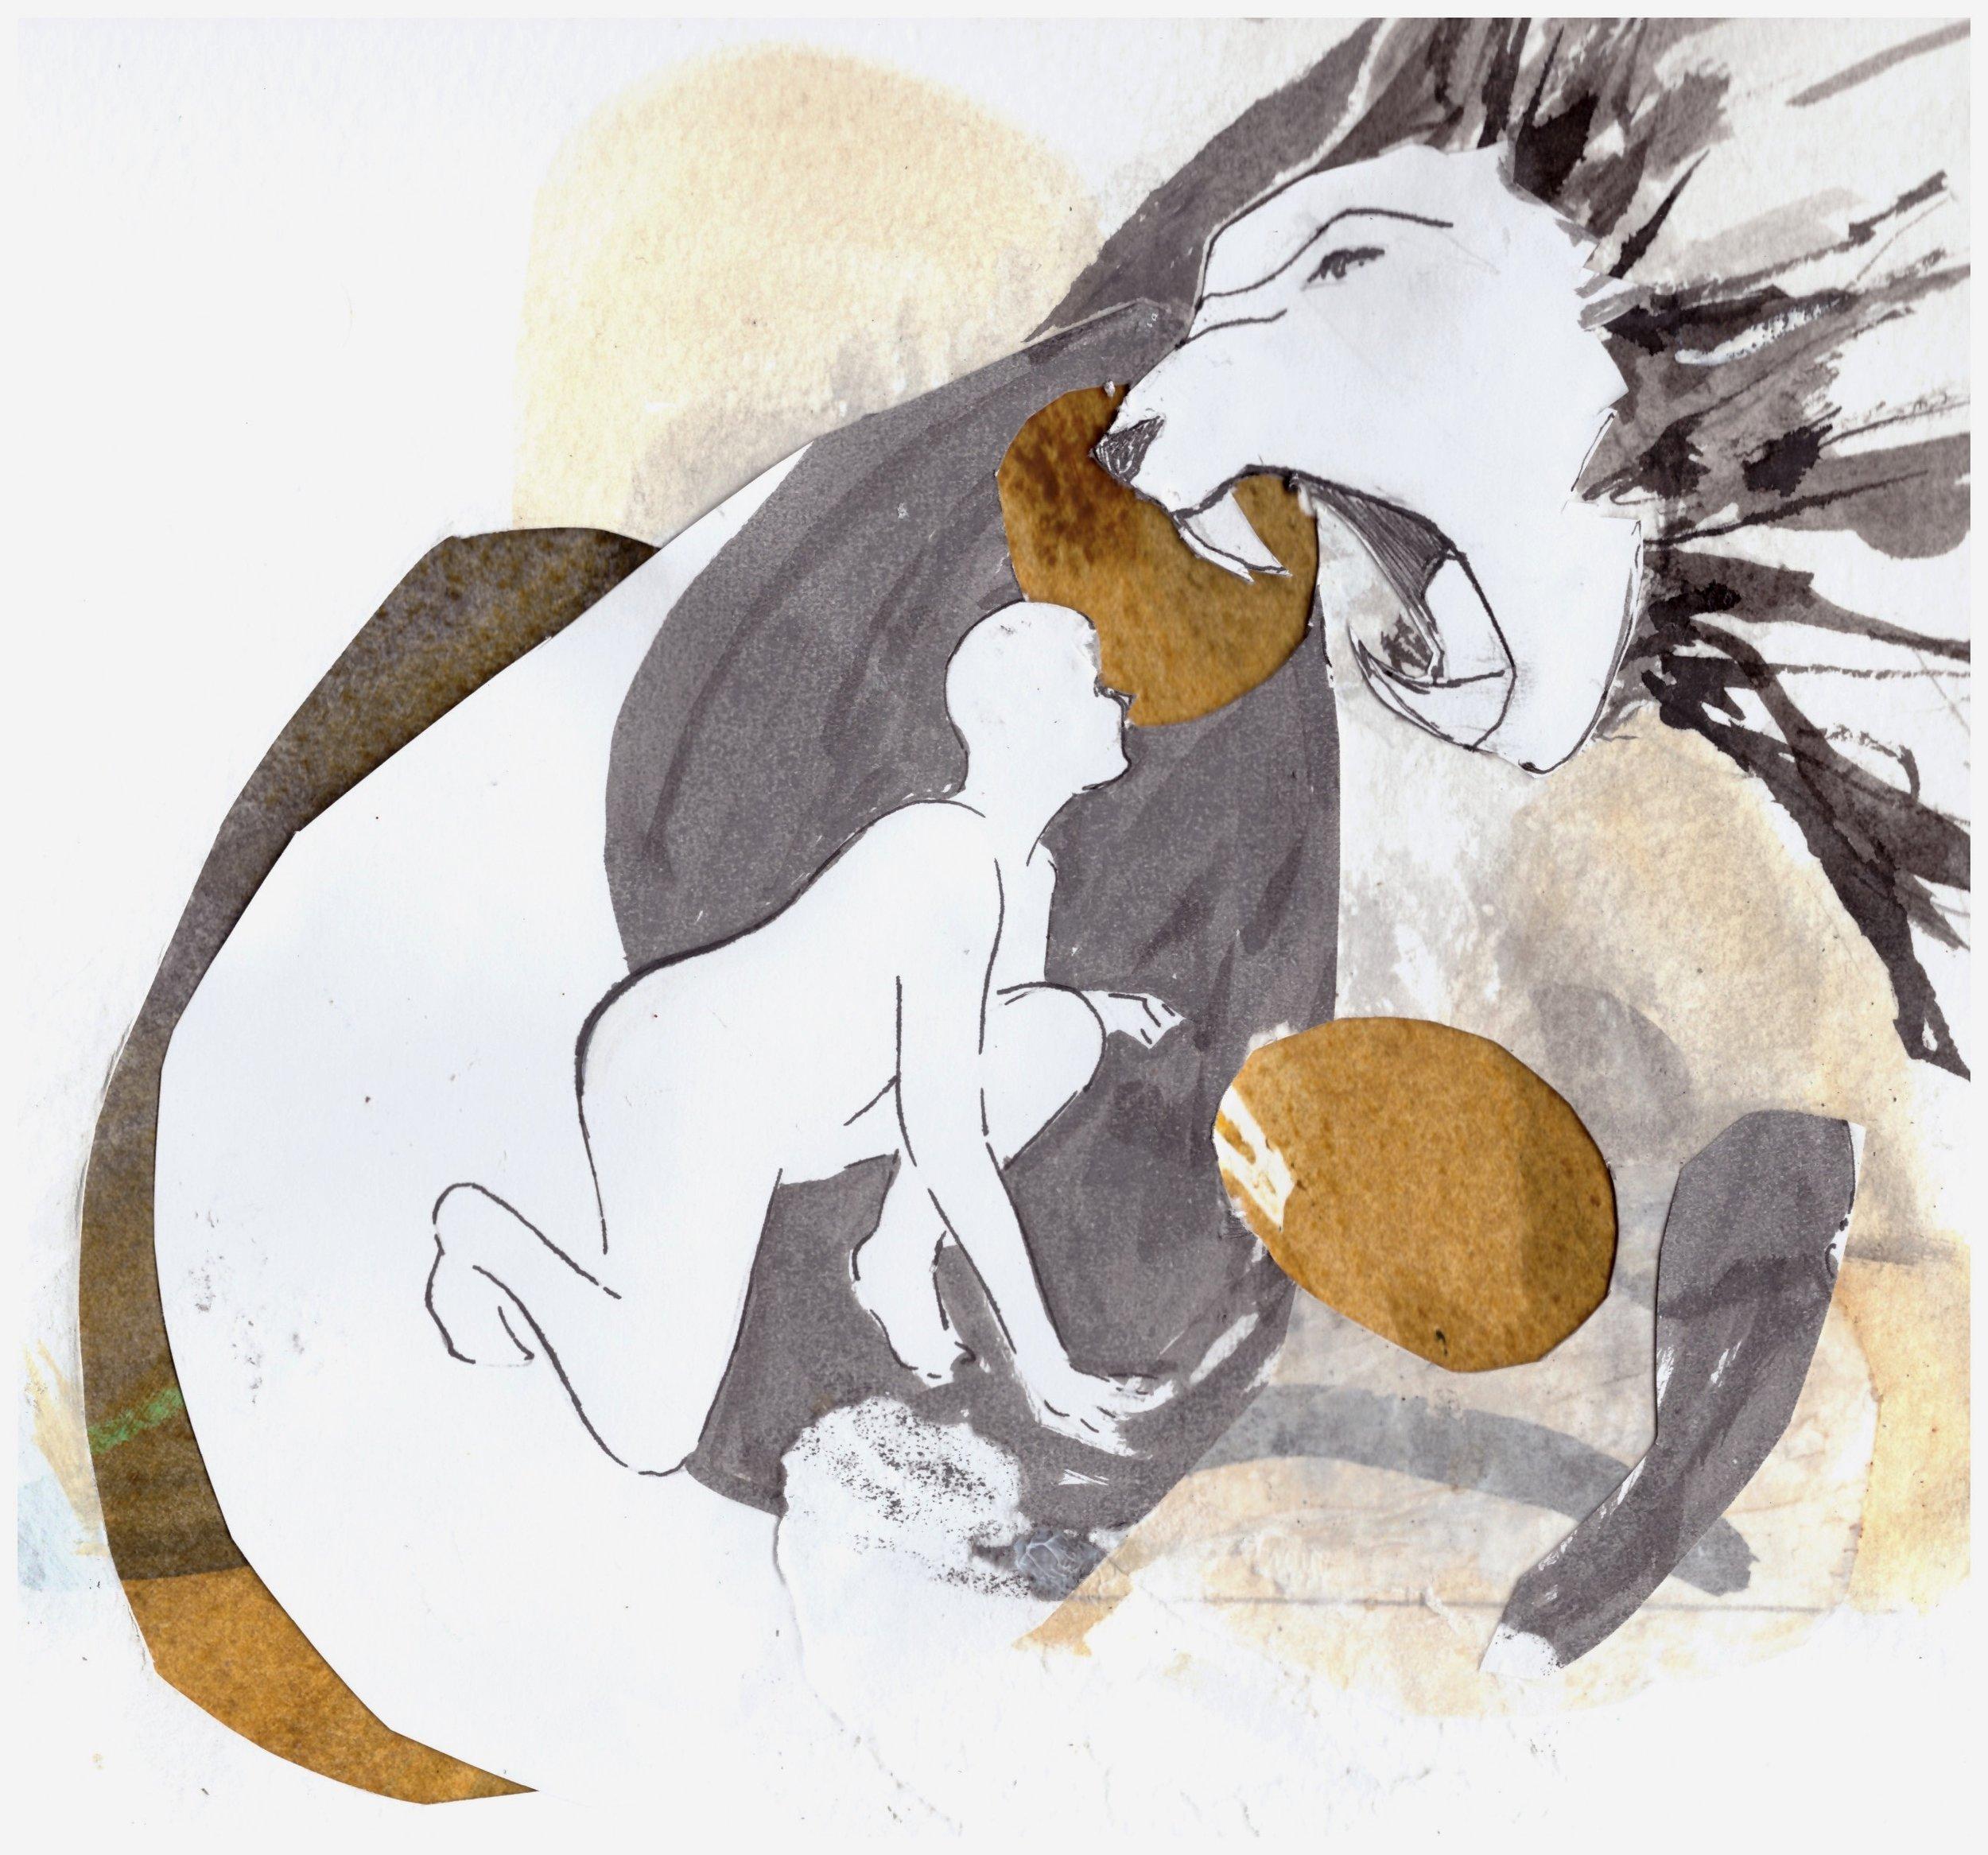 Artwork created by Maya Trifunovic.